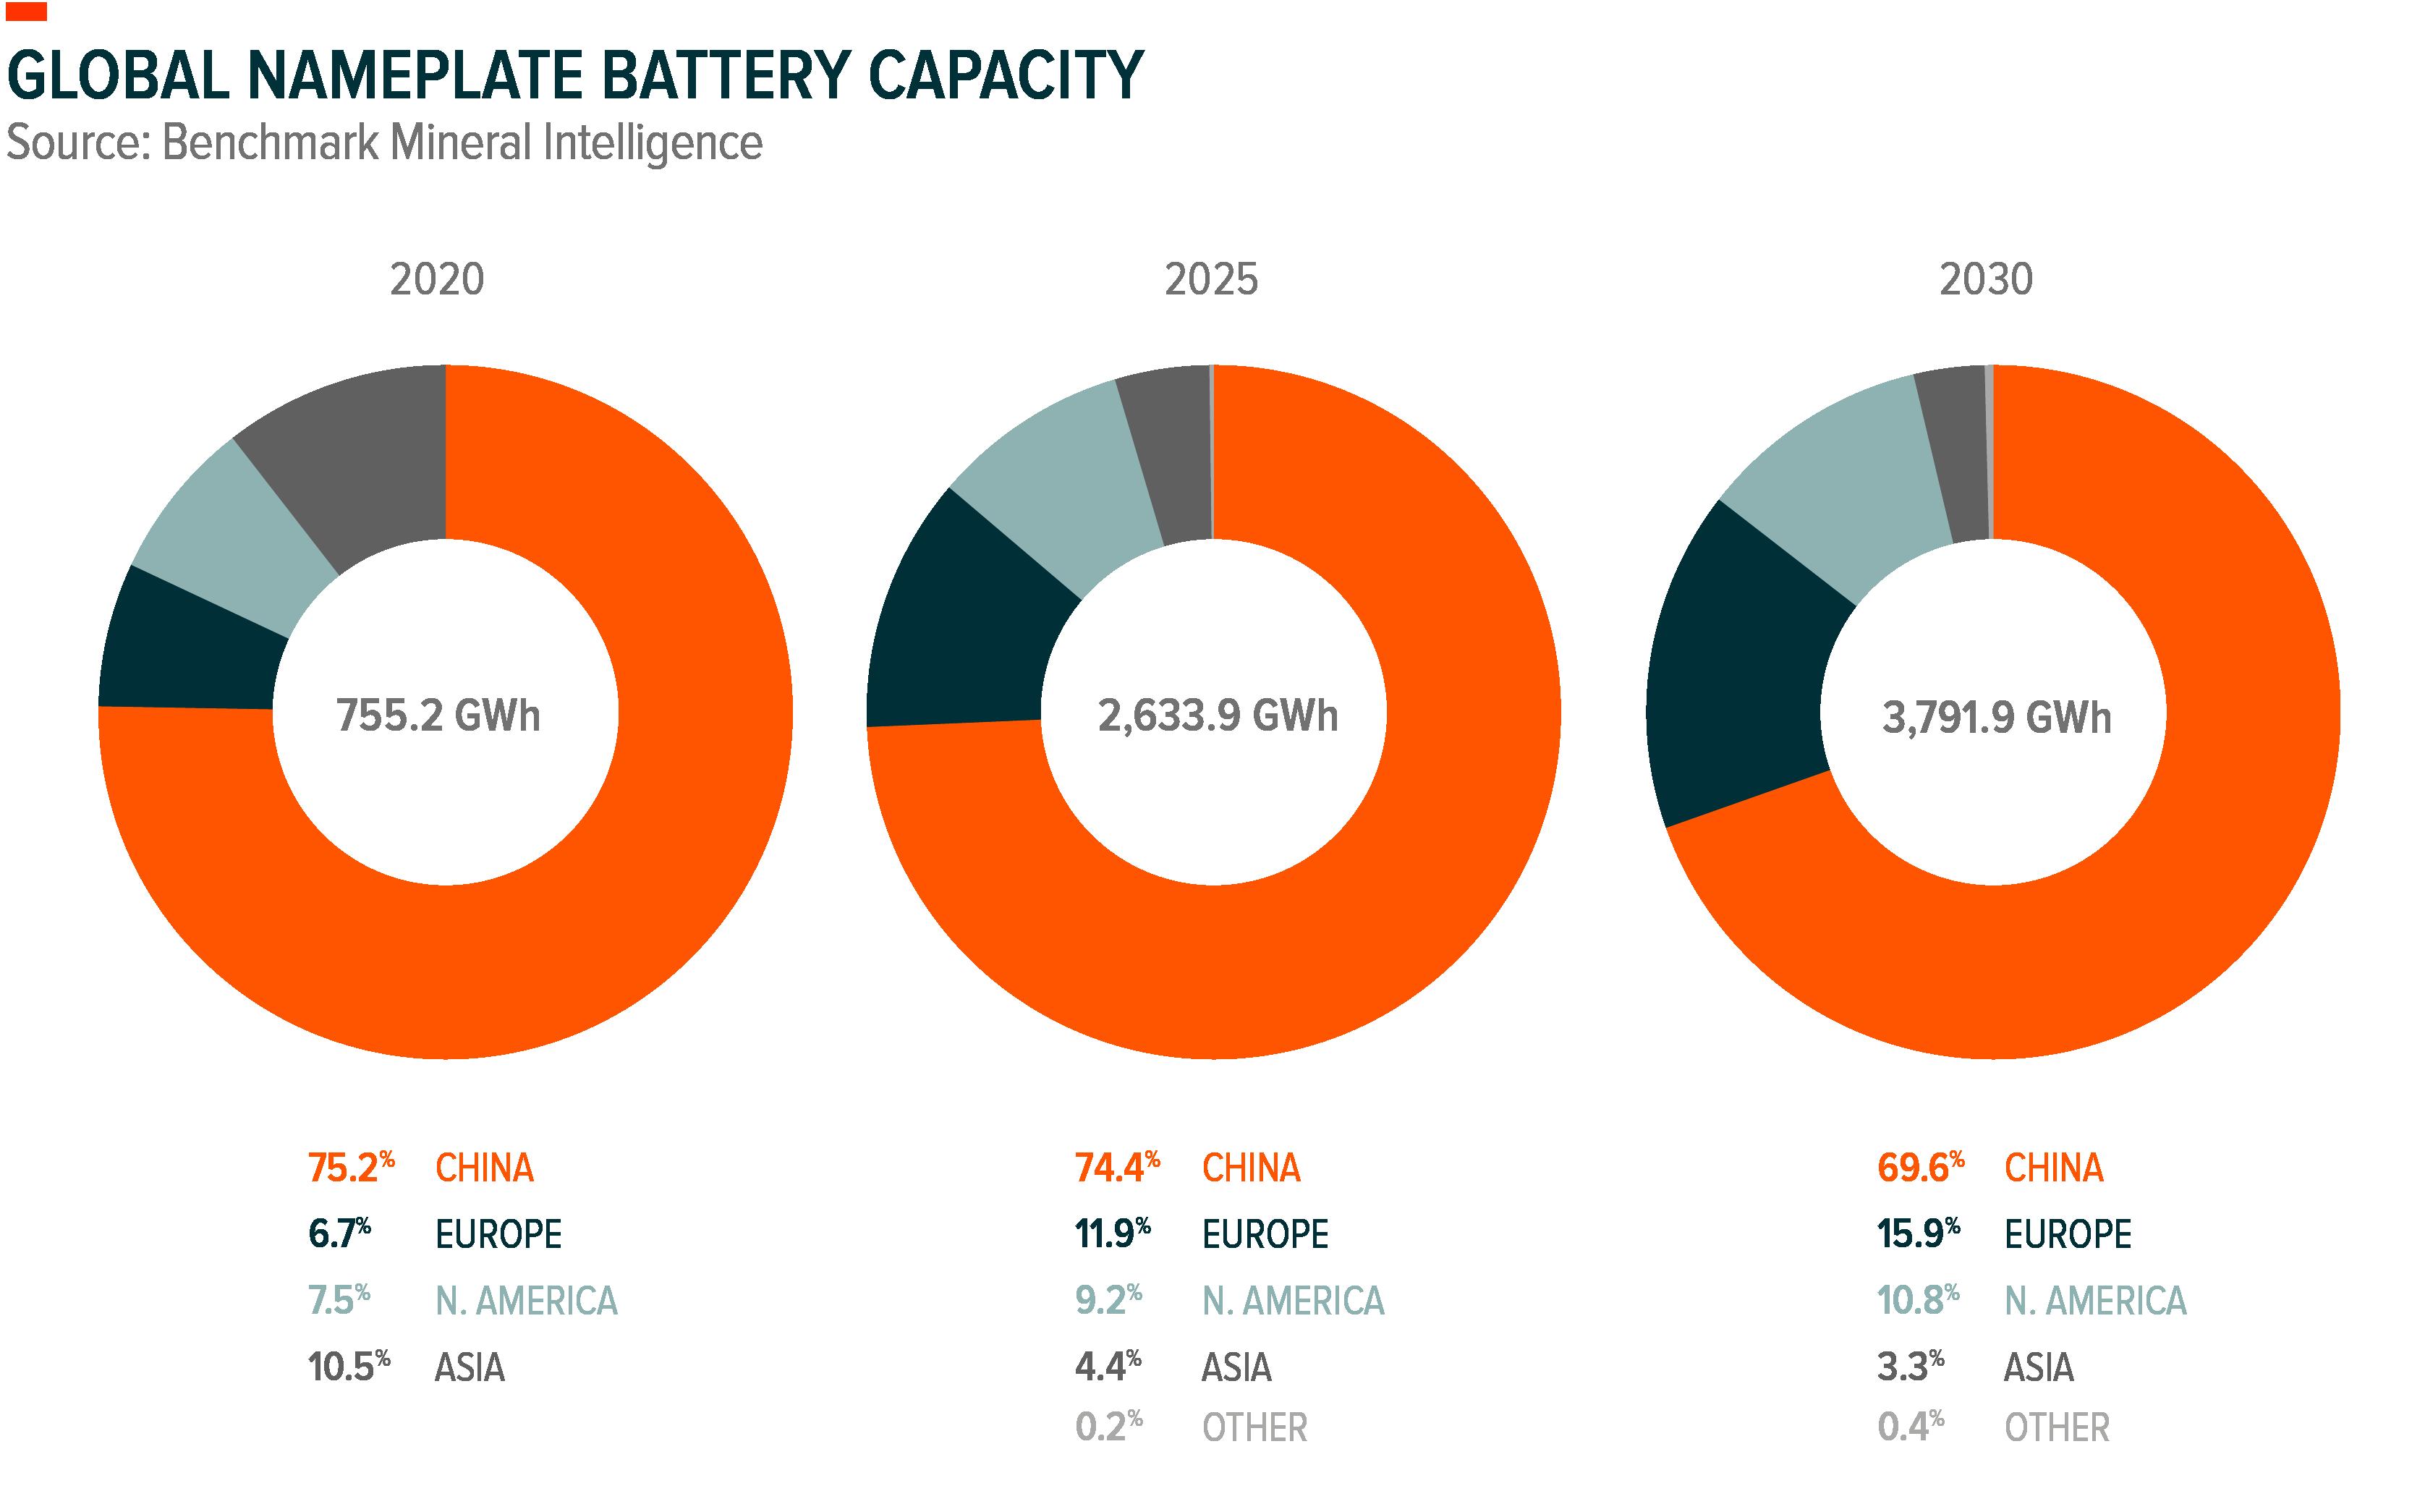 Global Nameplate Battery Capacity